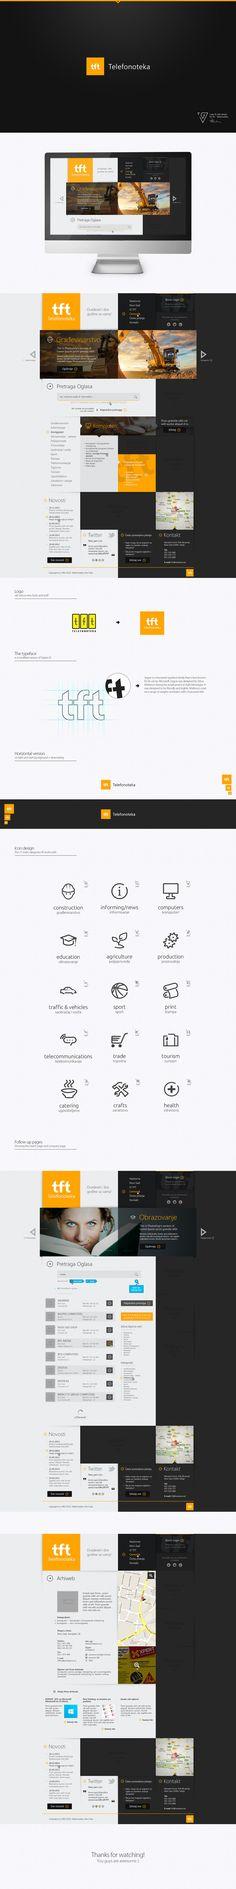 Logo and Web Design - TFT by ~Tngabor on deviantART